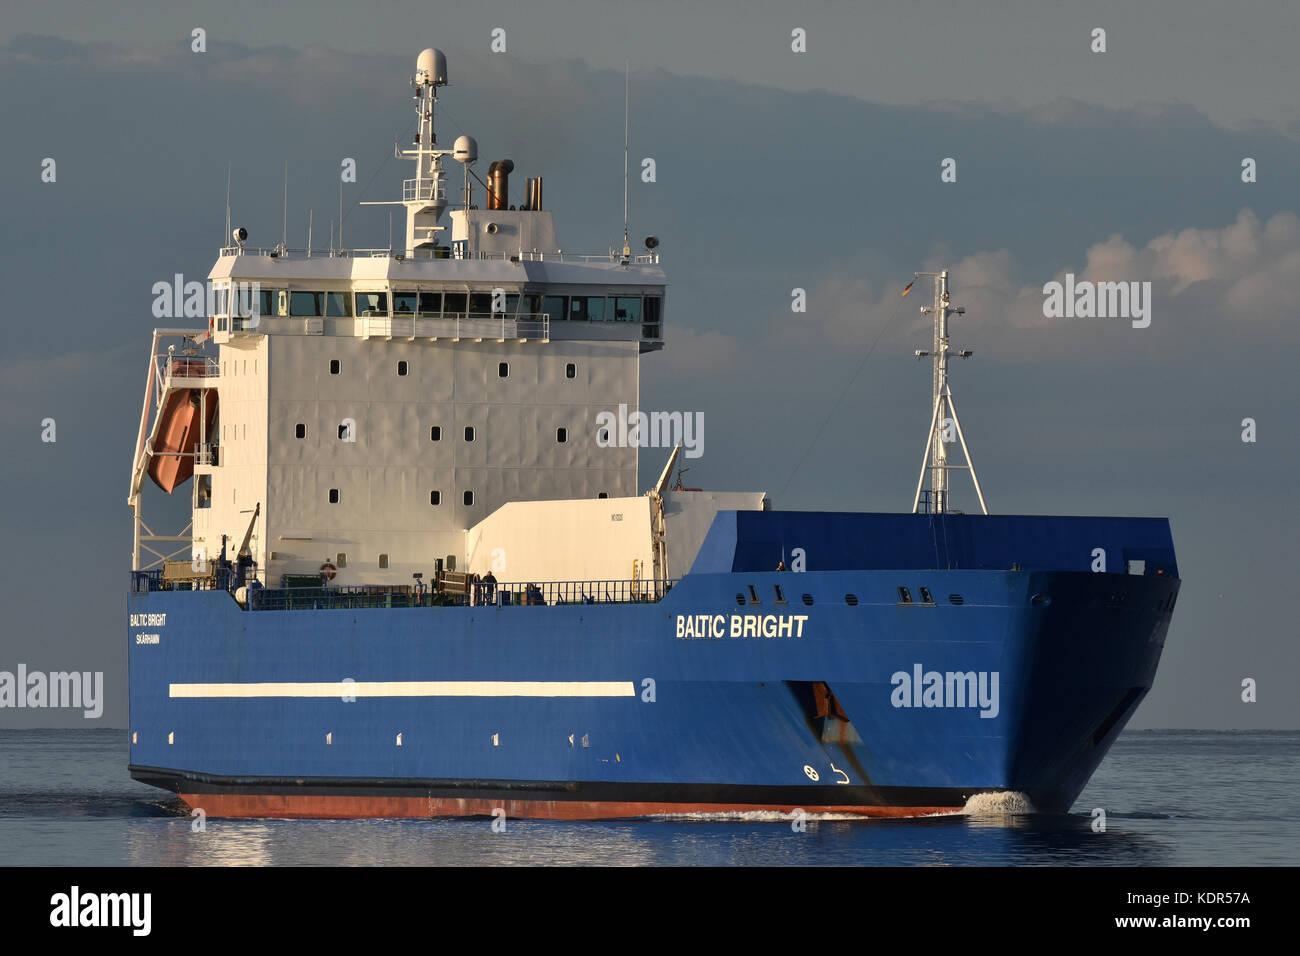 Baltic Bright - Stock Image